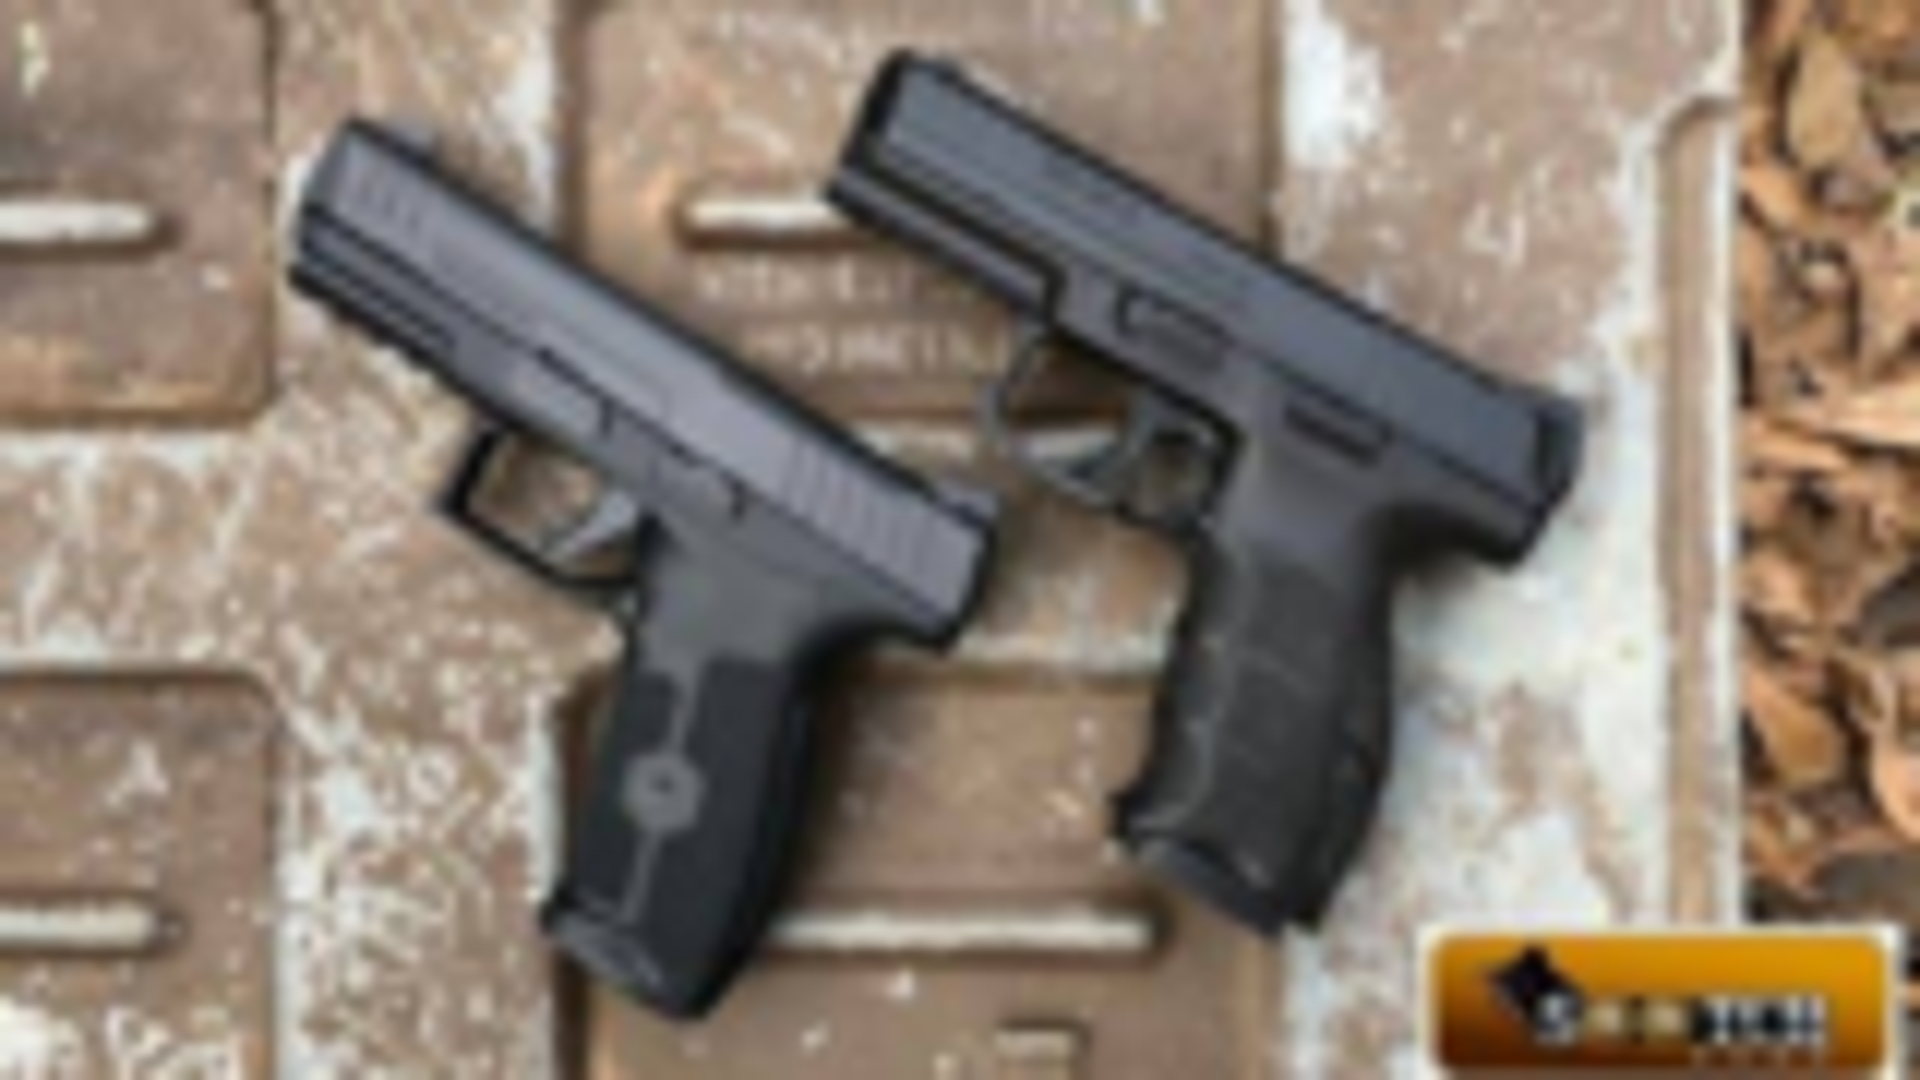 [sootch00]IWI马萨达9 vs HK VP9手枪